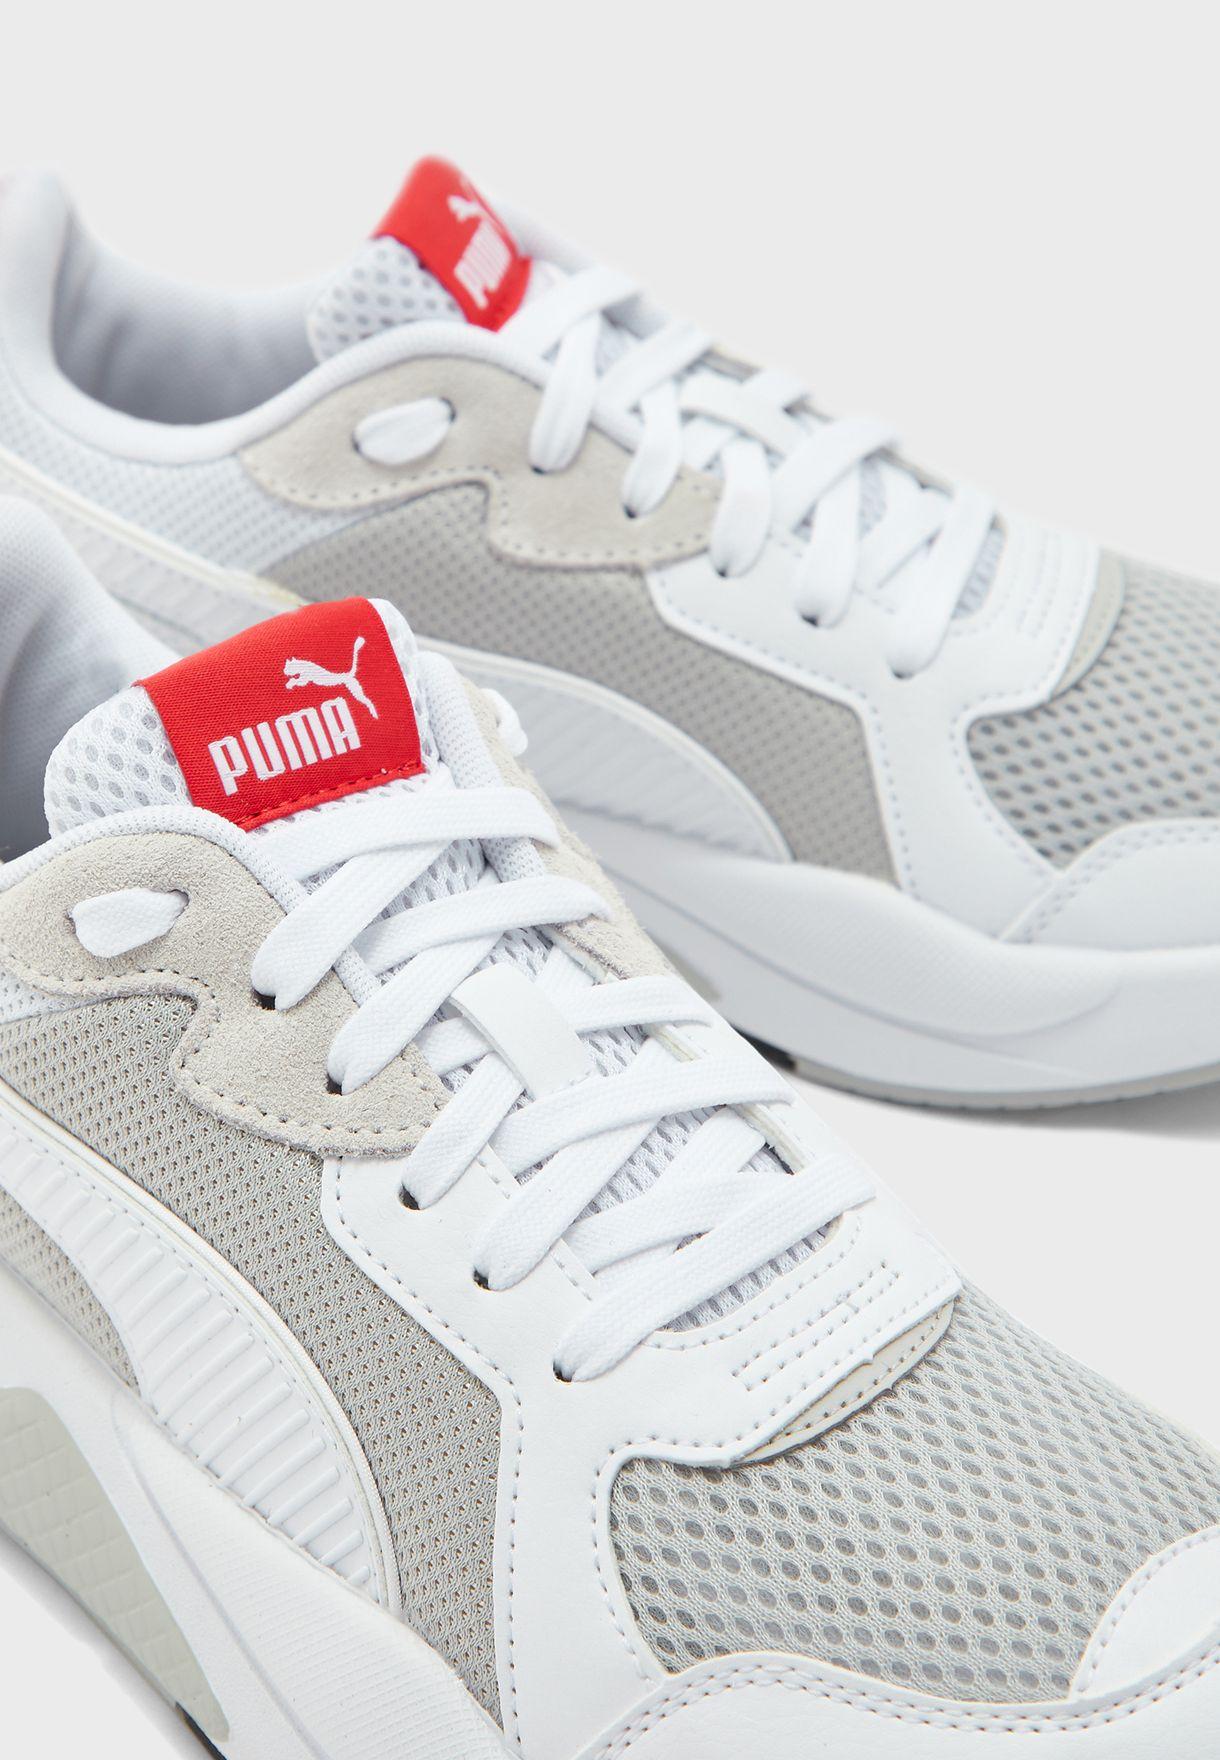 X-Ray men shoes